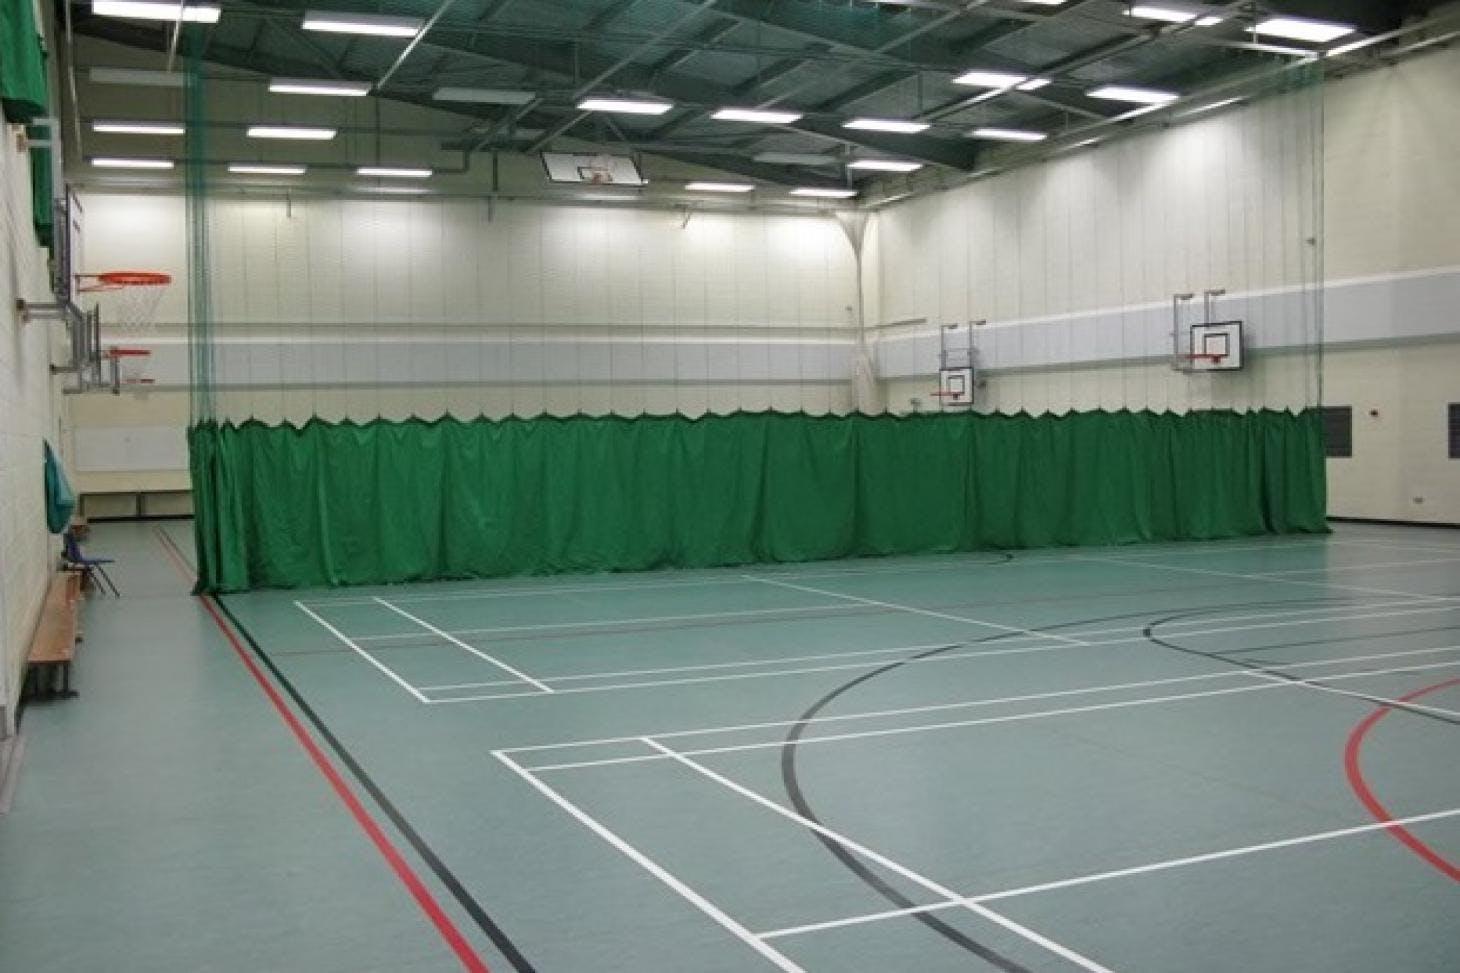 Denbigh High School Nets | Sports hall cricket facilities